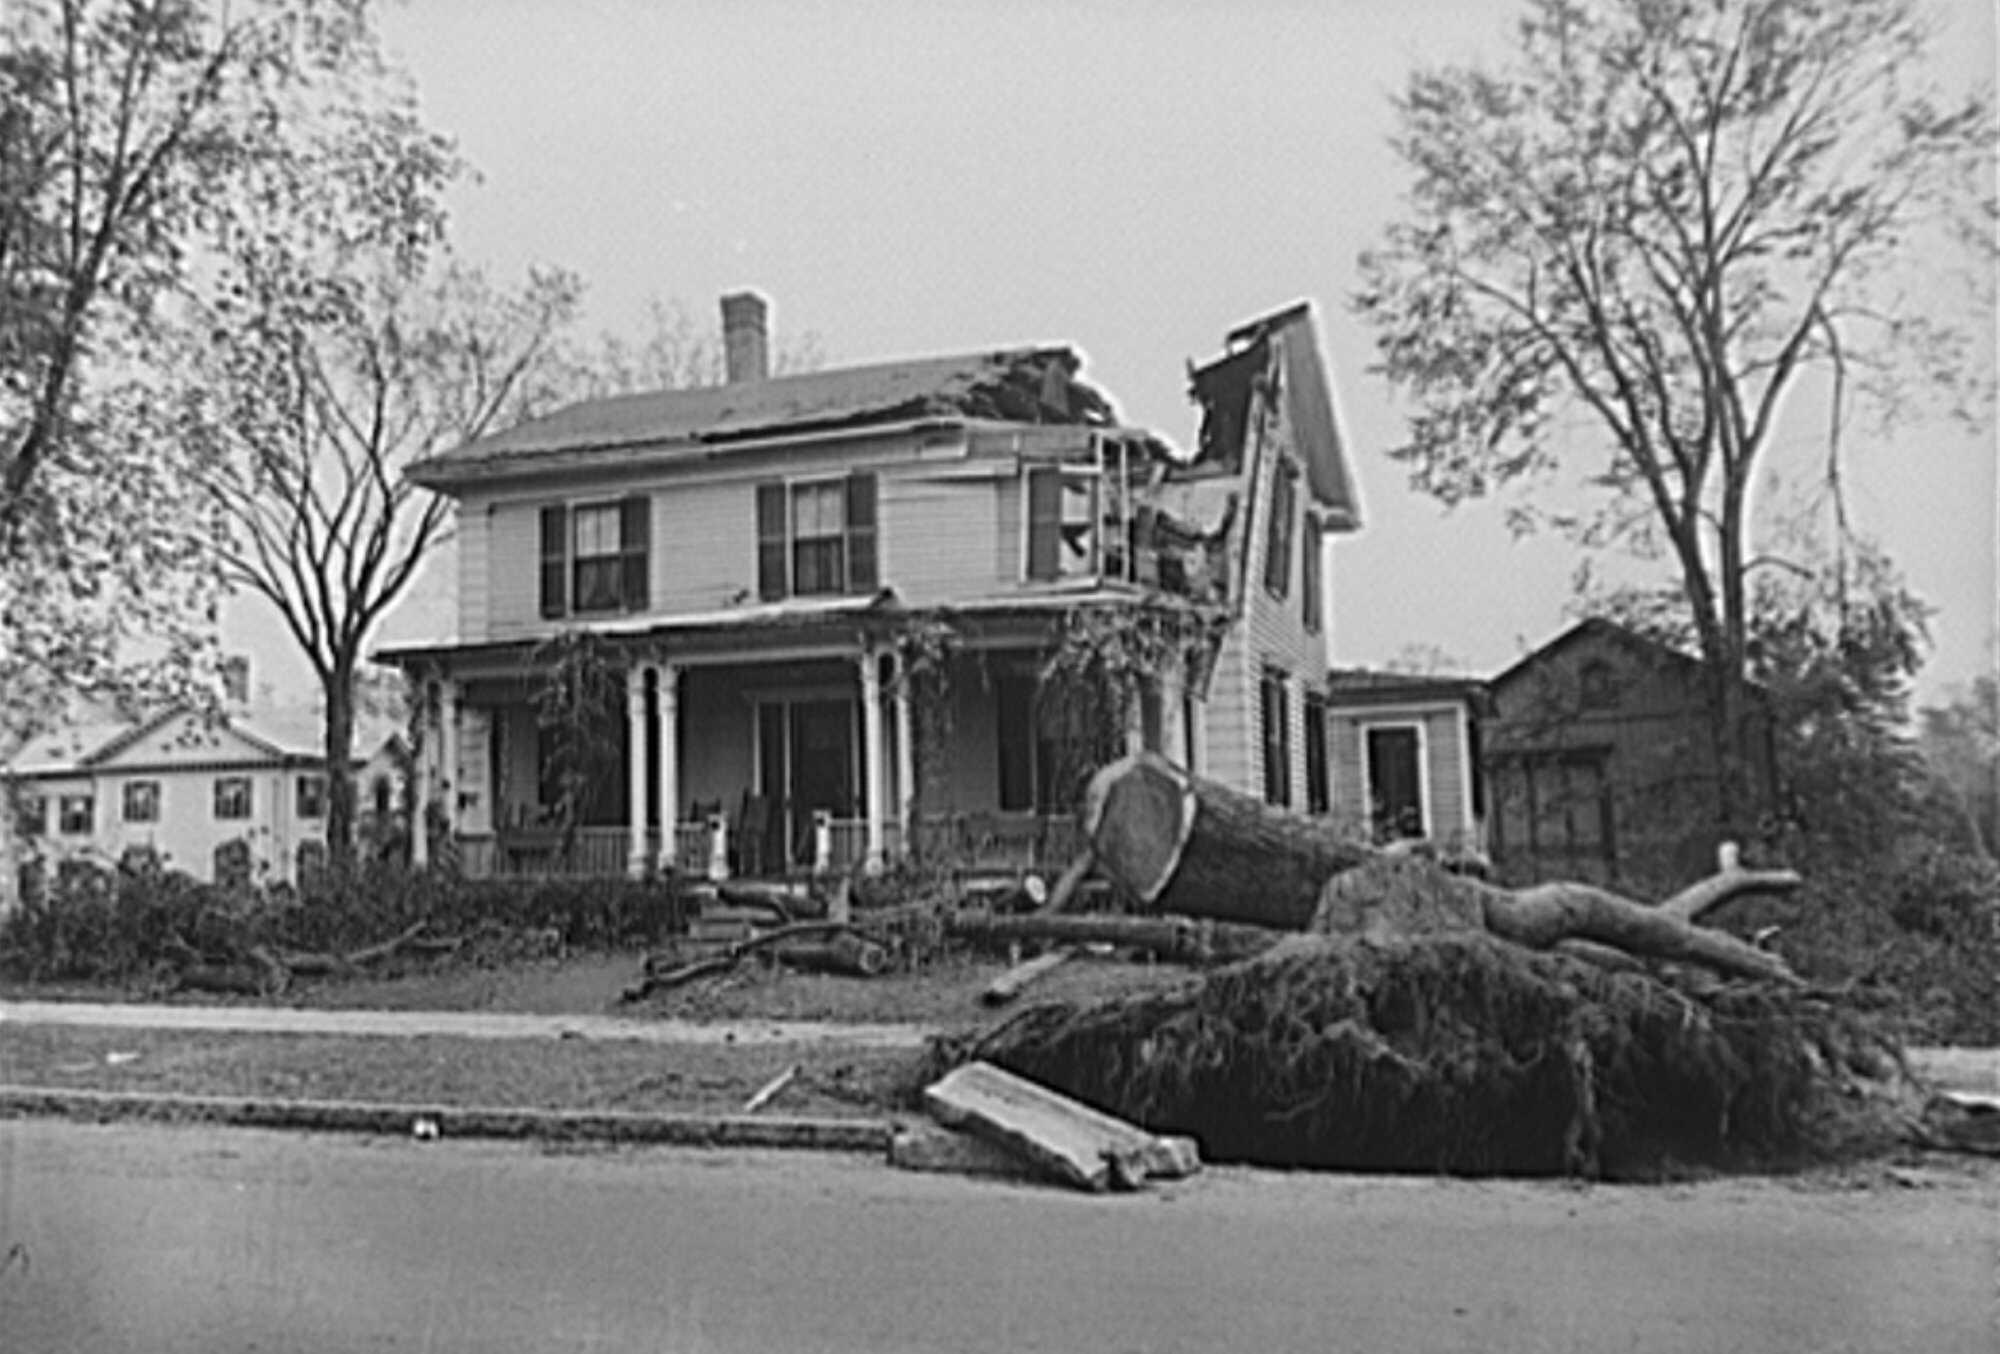 Hurricane-Crosson-House-in-Amherst,-MA-1938-LOC.jpg